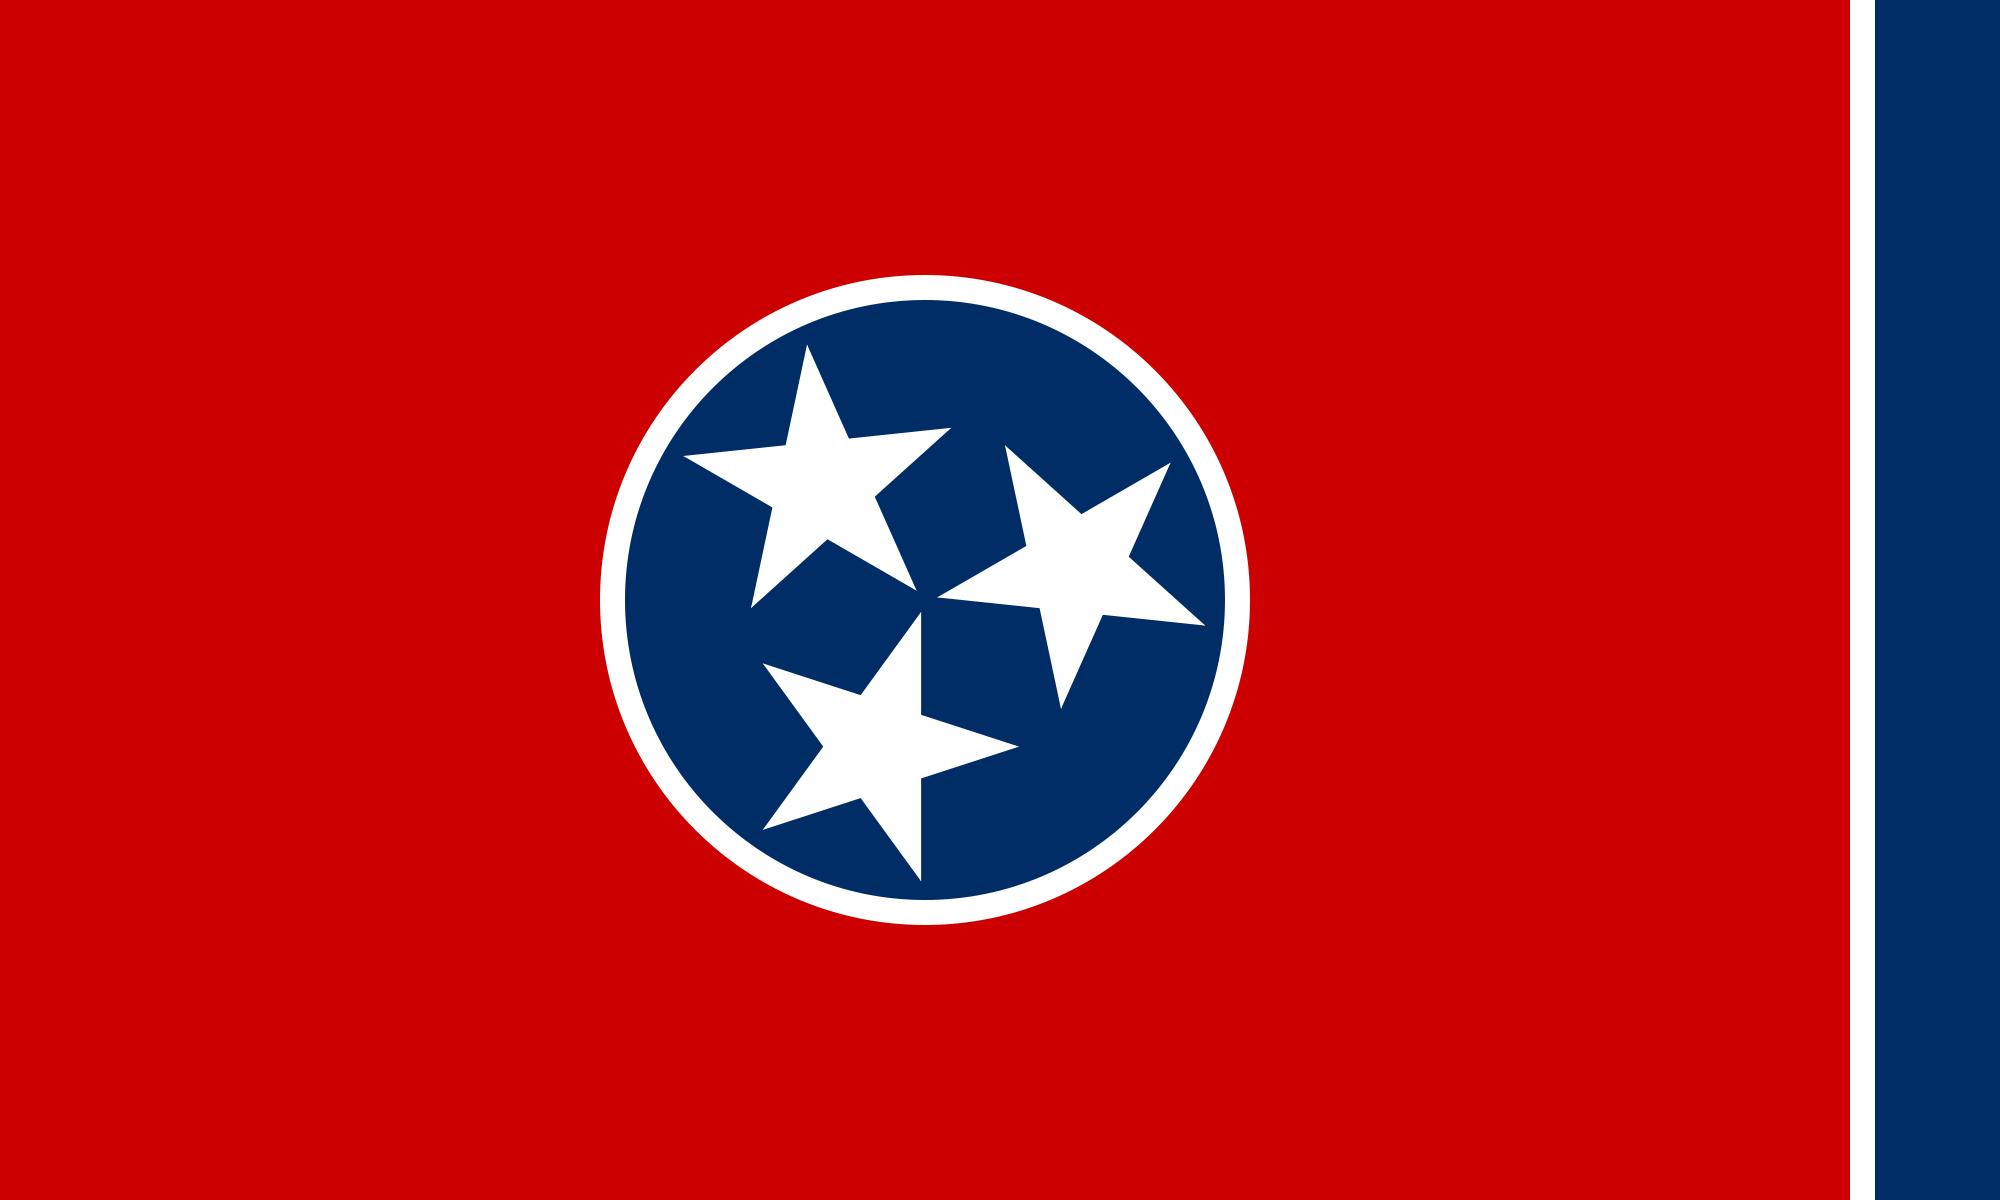 The Tennesse Flag. It's pretty rad.